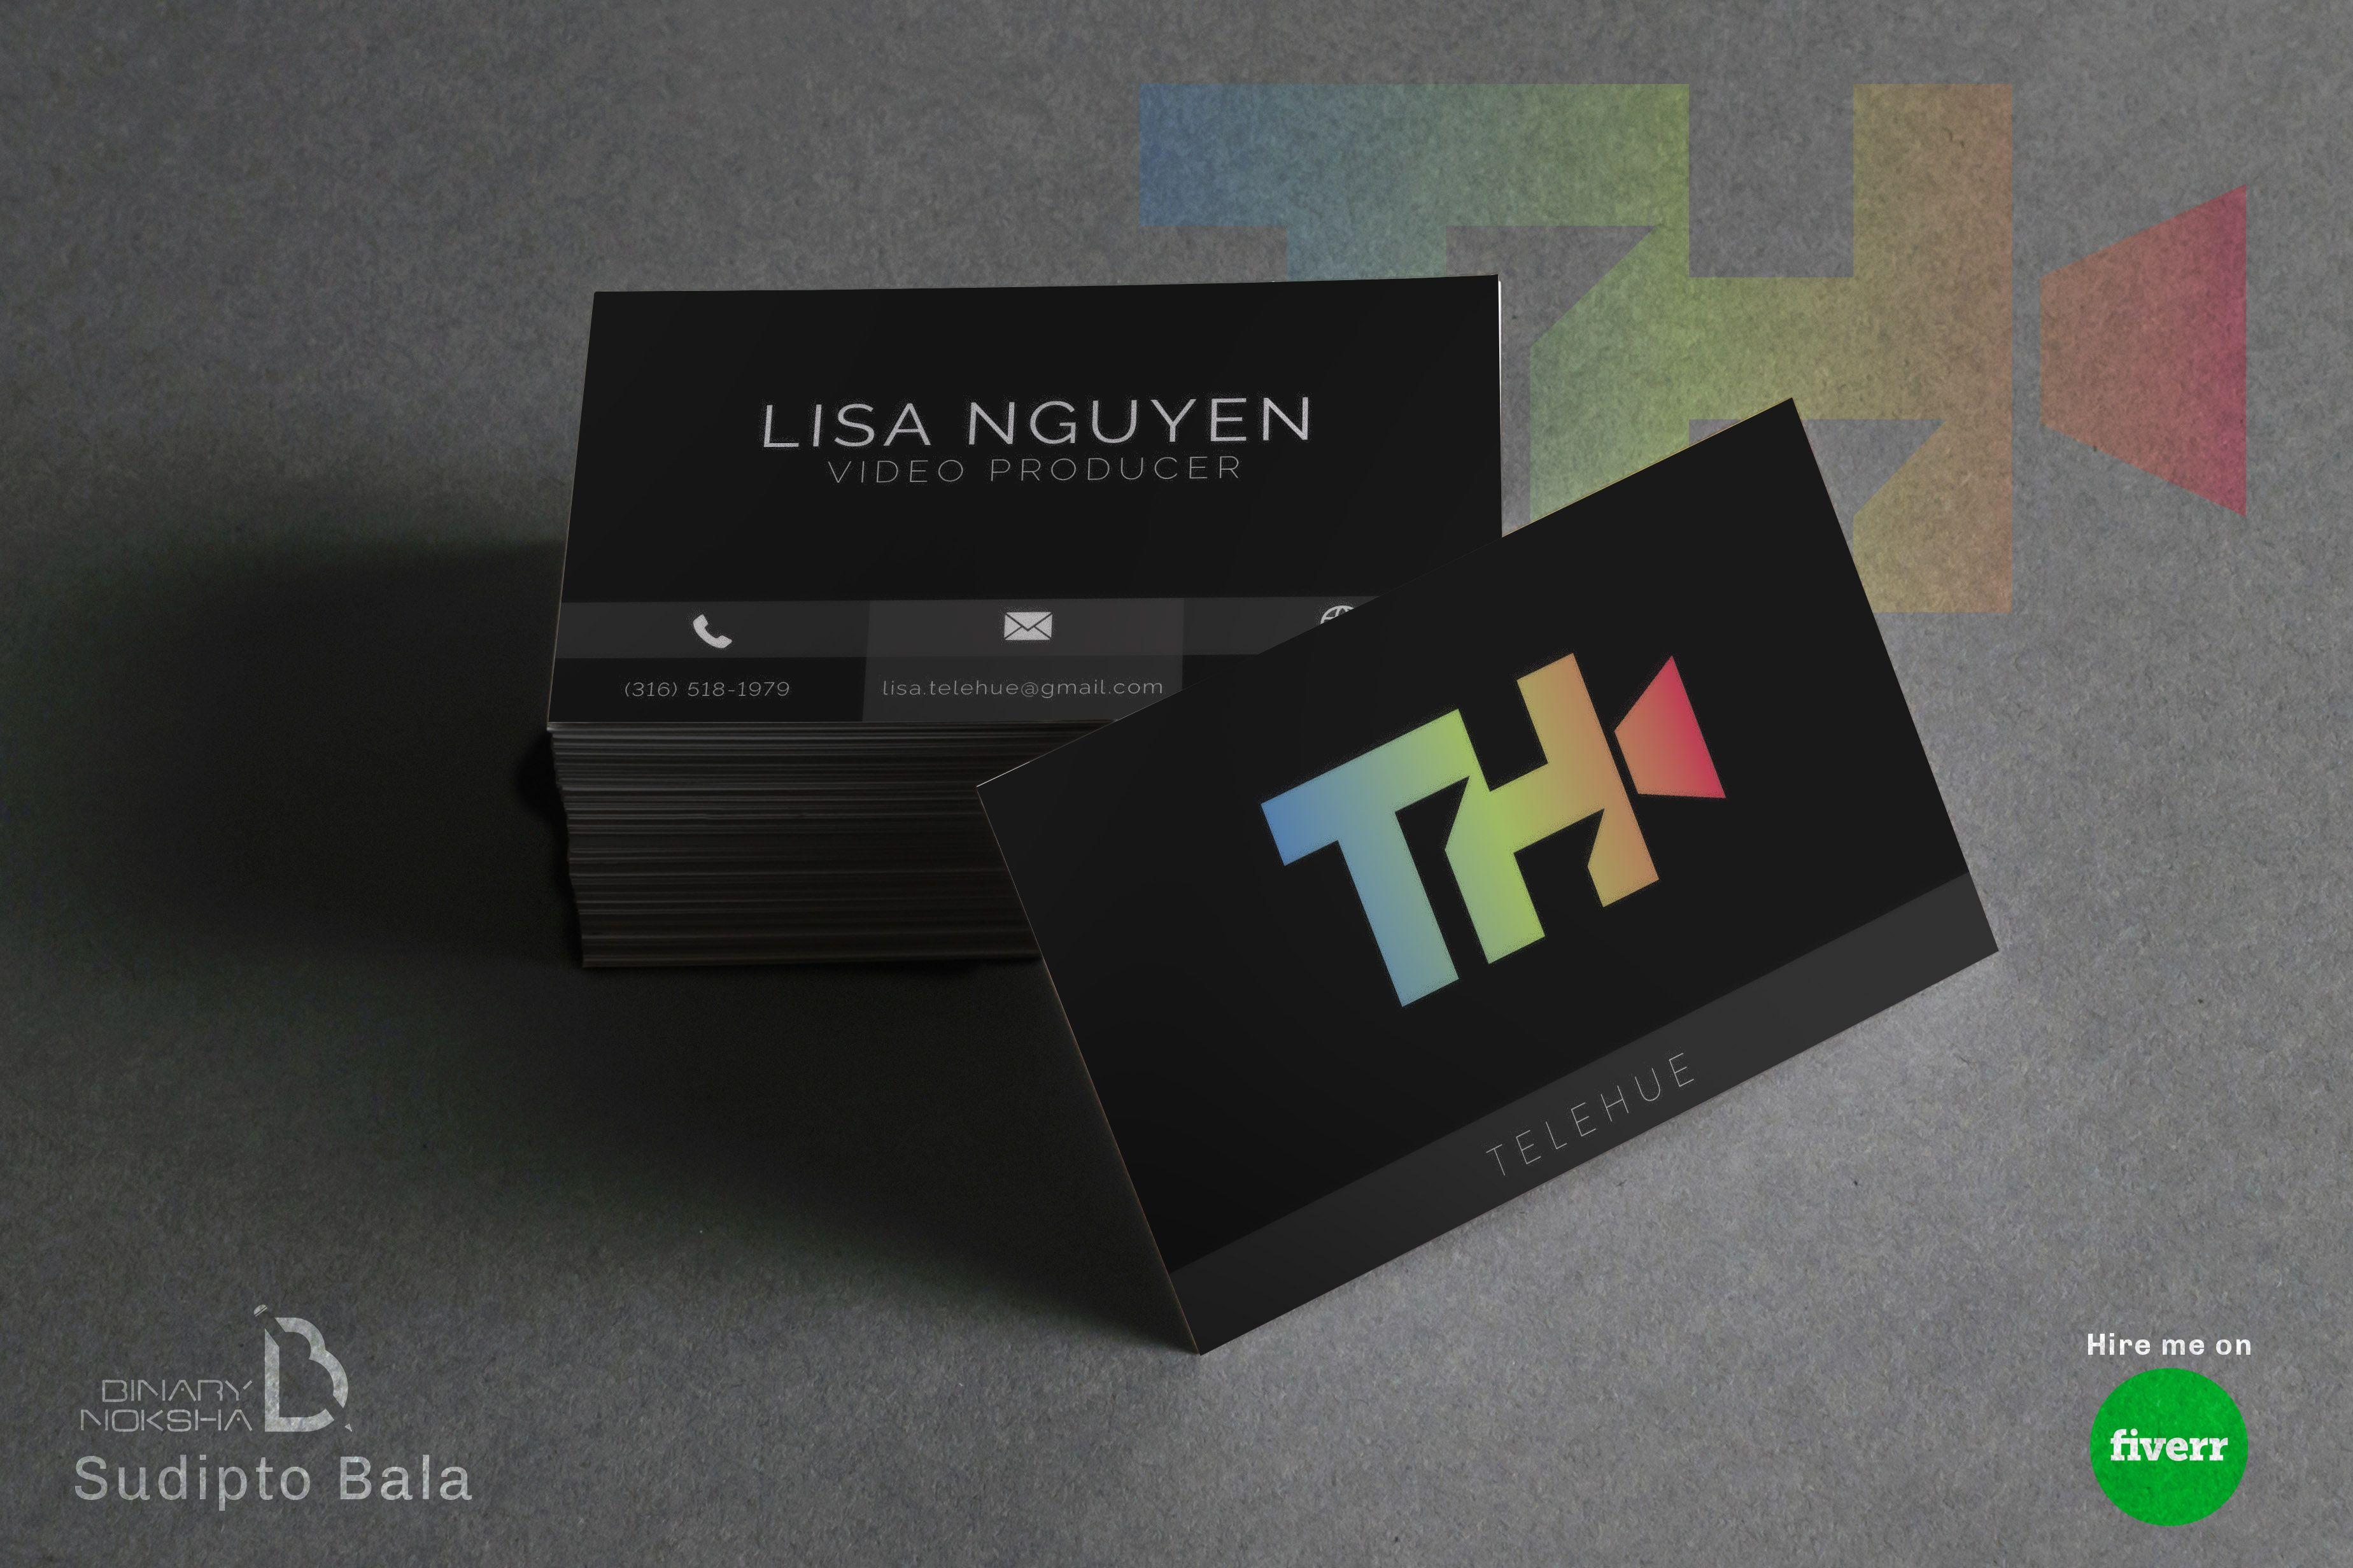 sudiptobala : I will design unique business card or visiting card ...